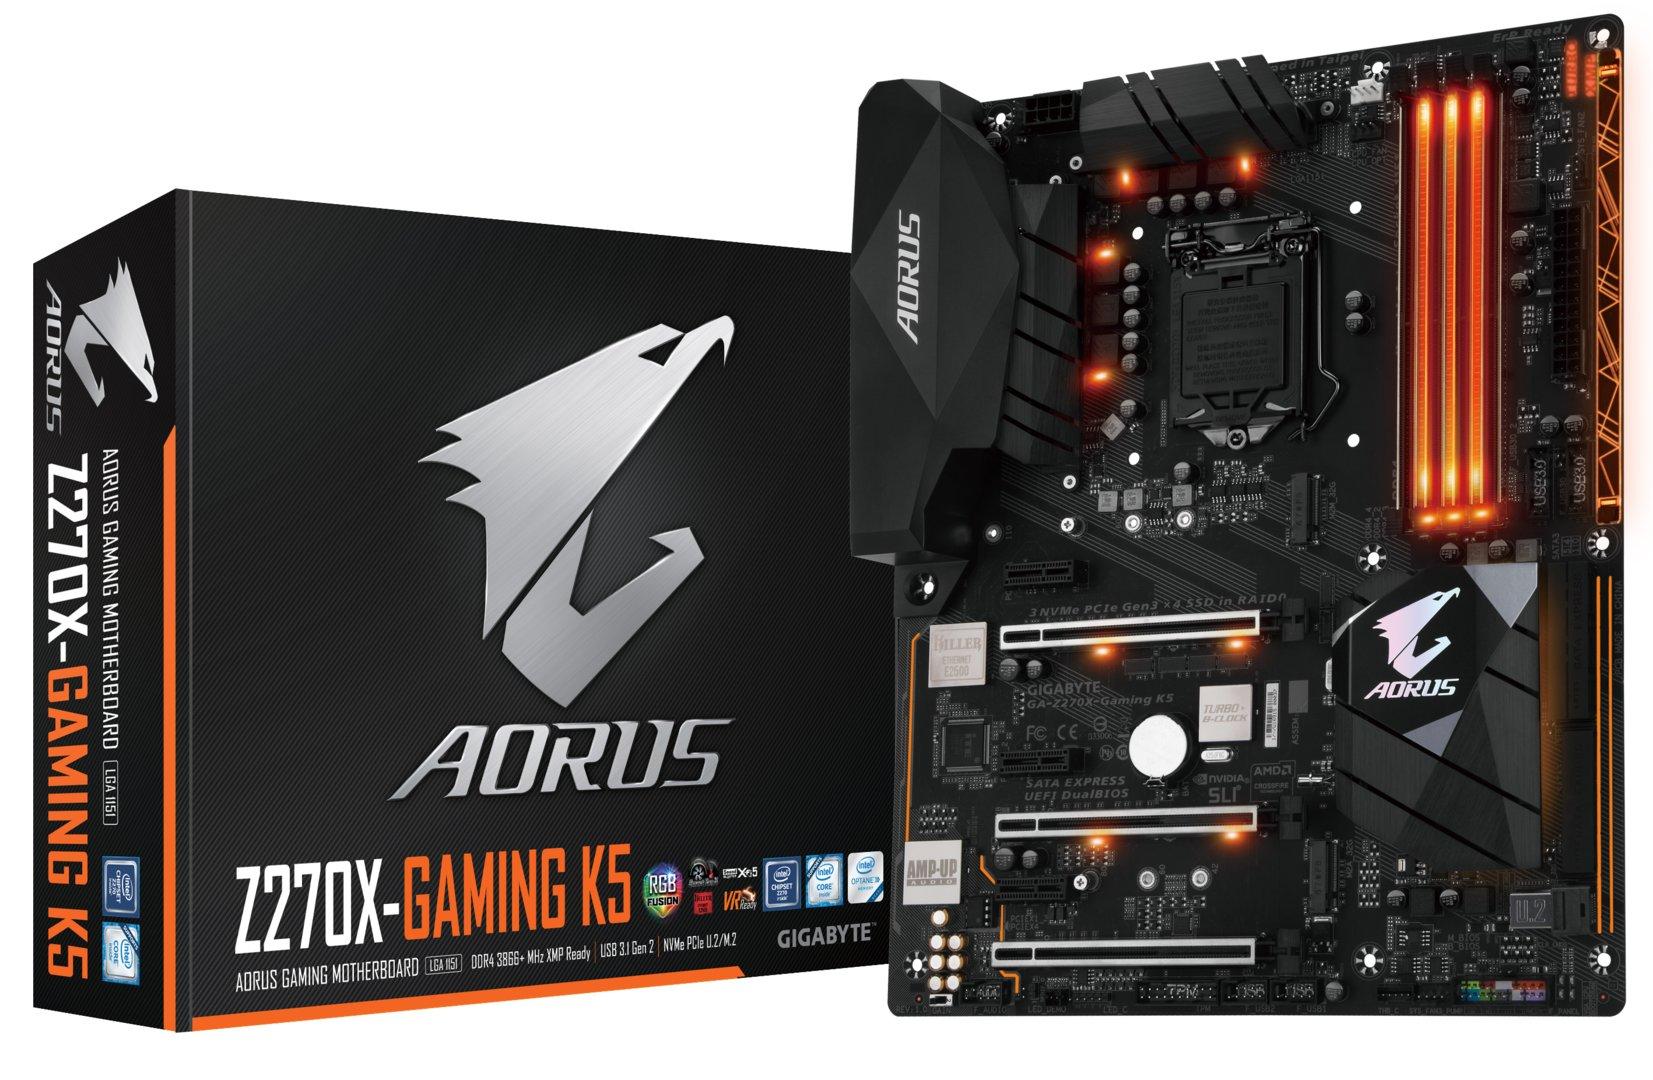 Gigabyte GA-Z270X-Gaming K5